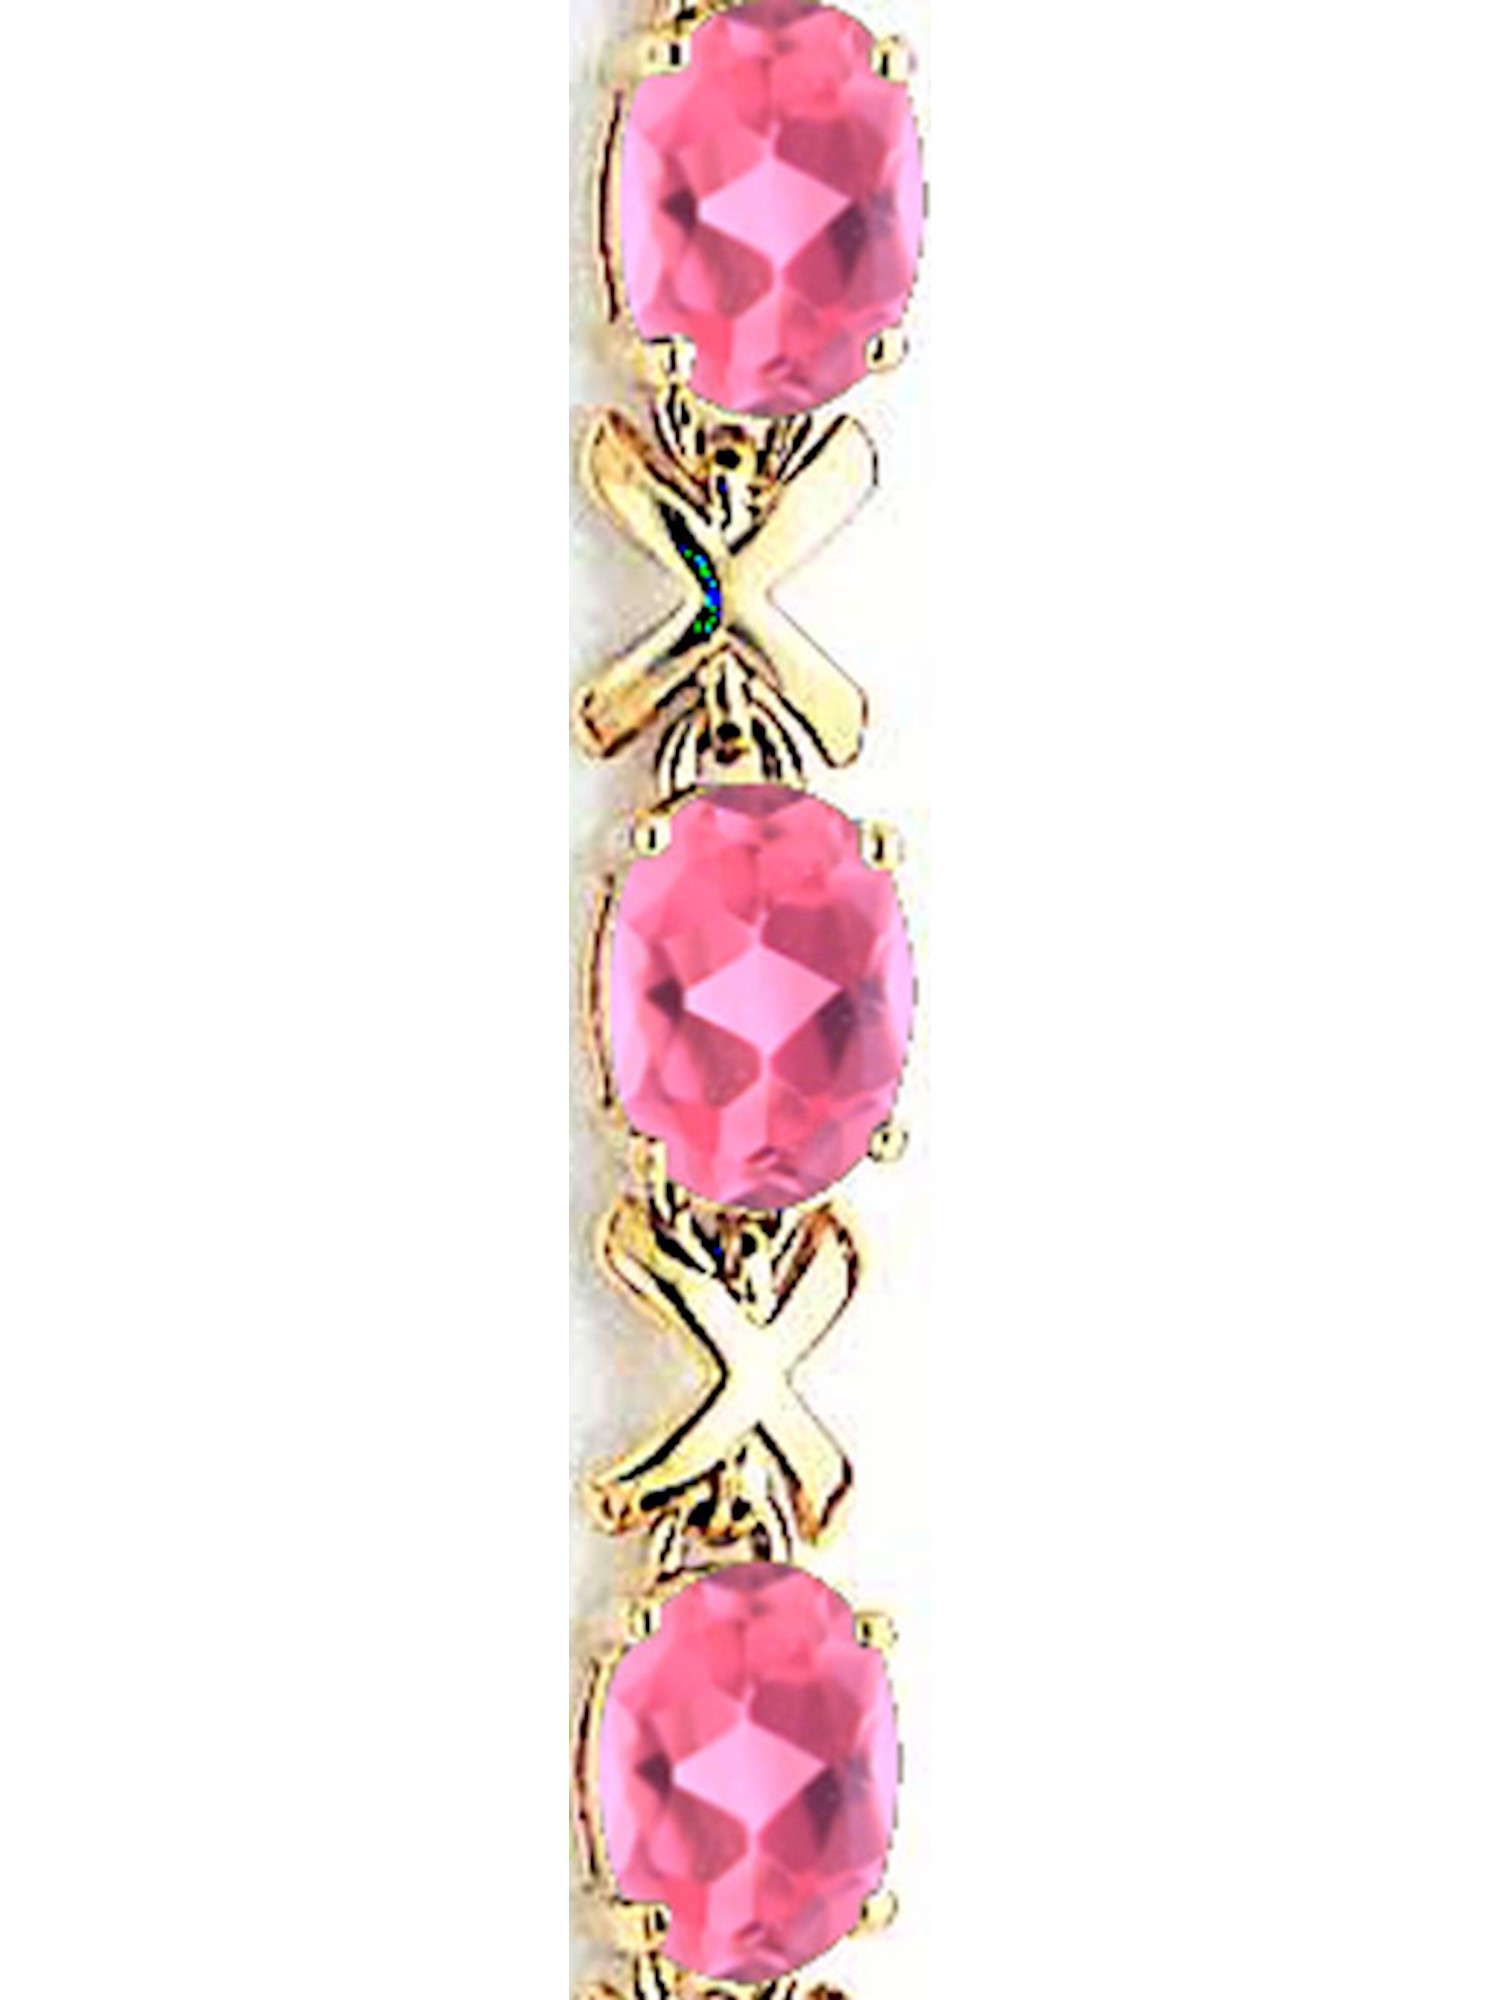 14k Yellow Gold 7x5mm Oval Pink Tourmaline bracelet by